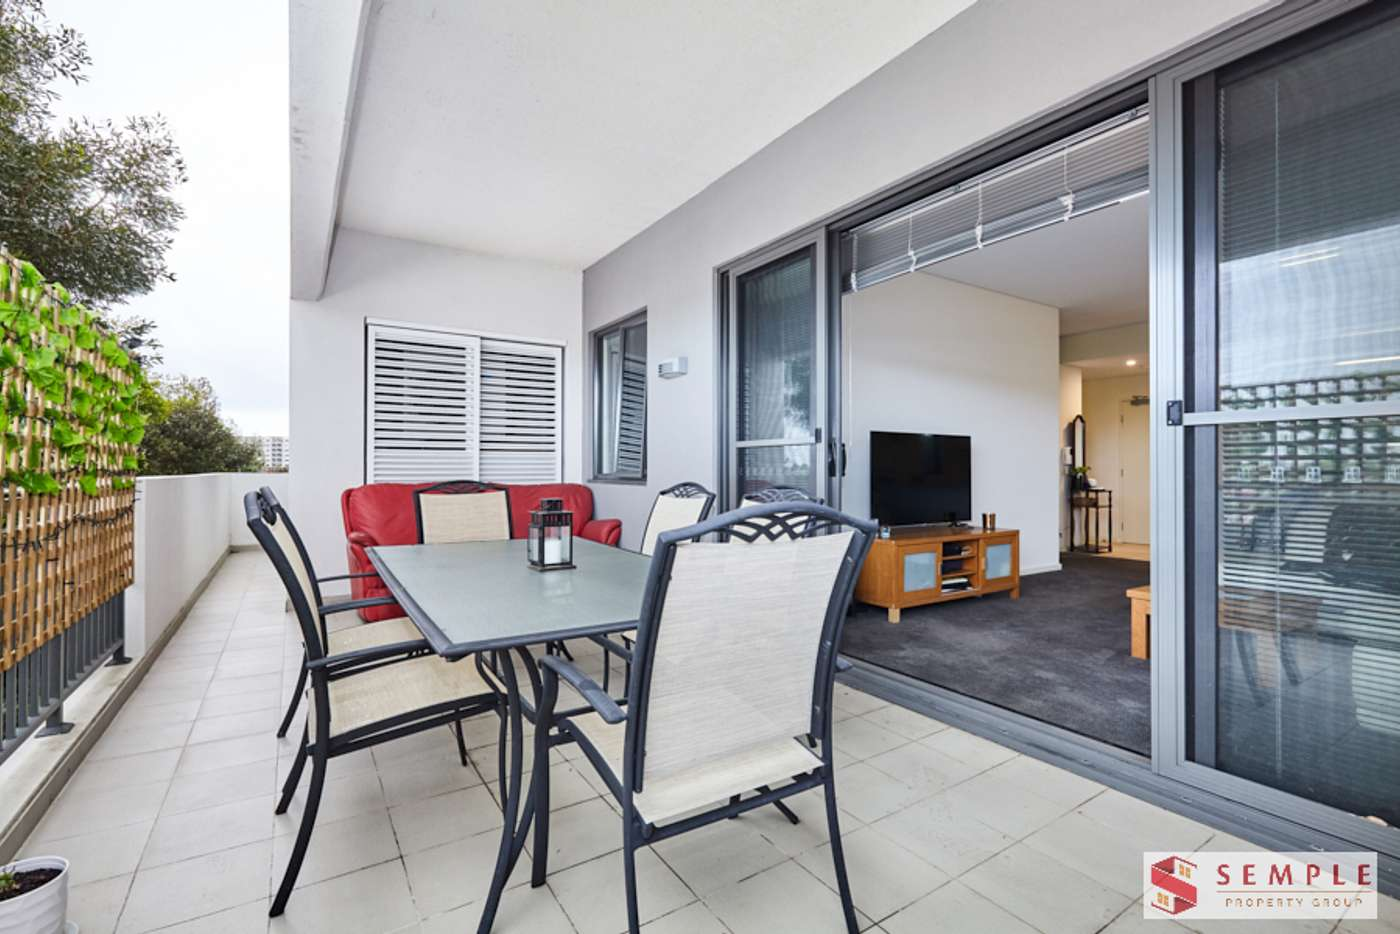 Main view of Homely apartment listing, 50/16 Midgegooroo Avenue, Cockburn Central WA 6164